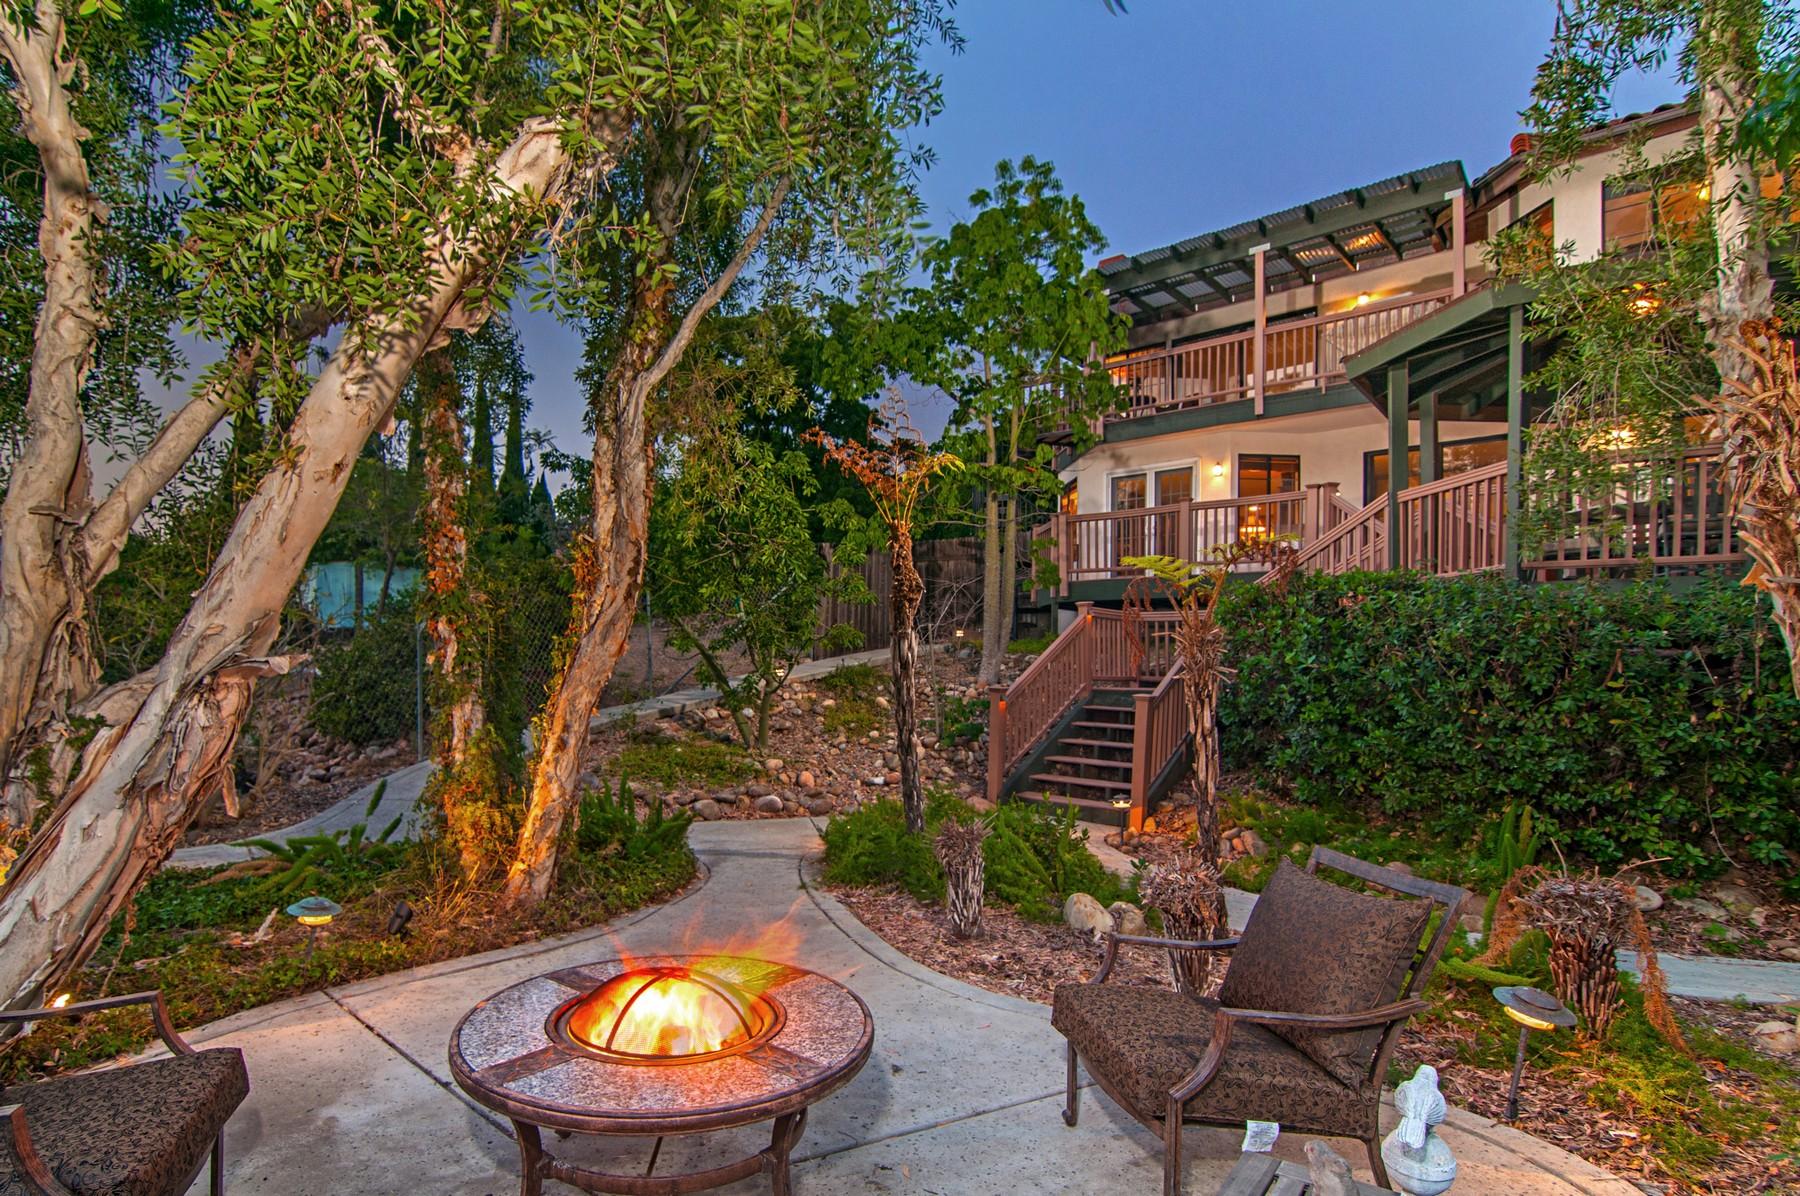 Single Family Home for Sale at 5534 Lesa Road La Mesa, California, 91942 United States